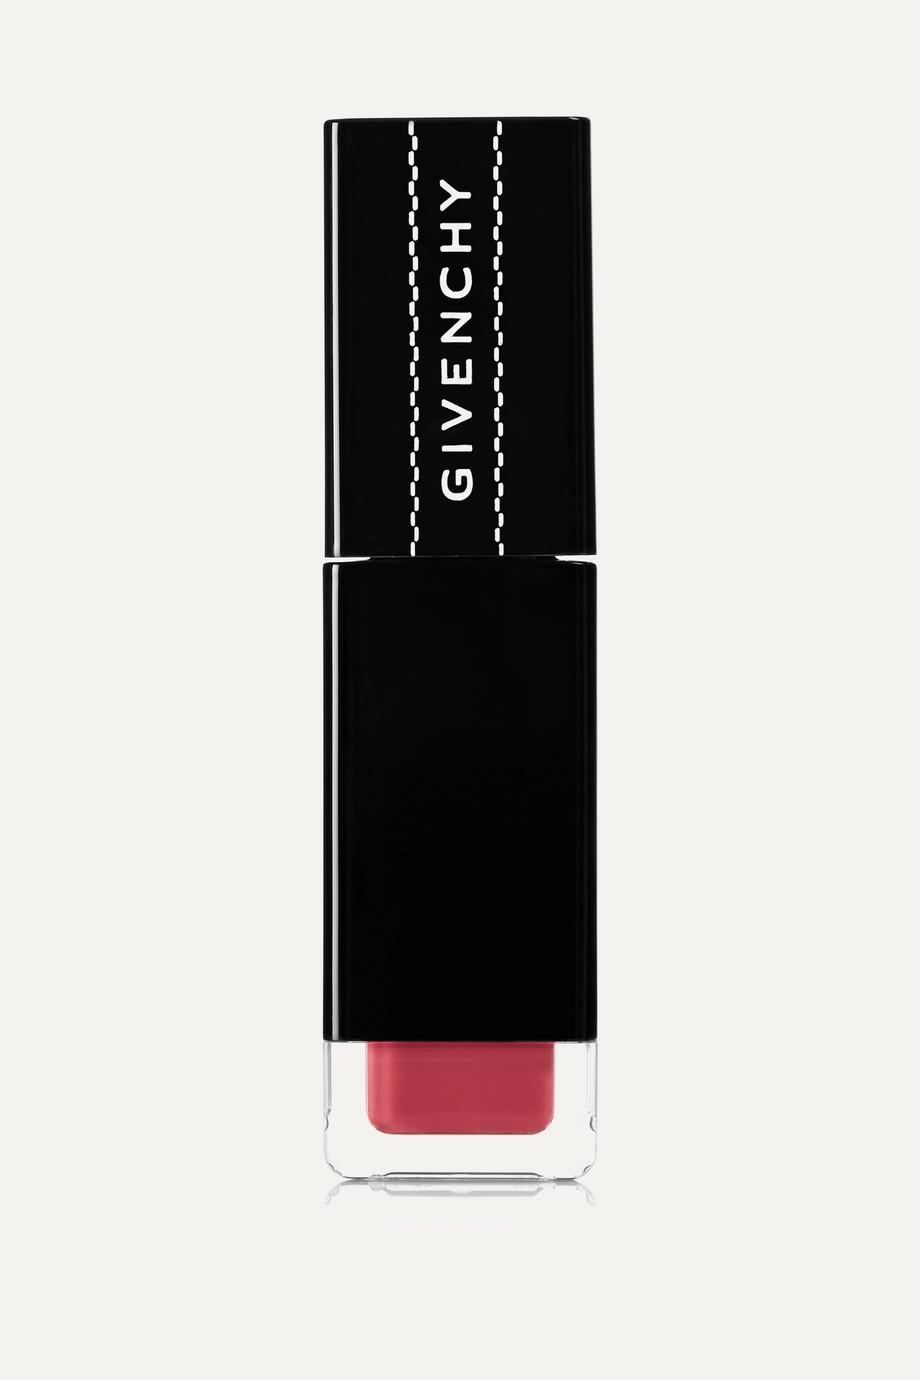 Givenchy Beauty Encre Interdite Liquid Lipstick - Arty Pink 02